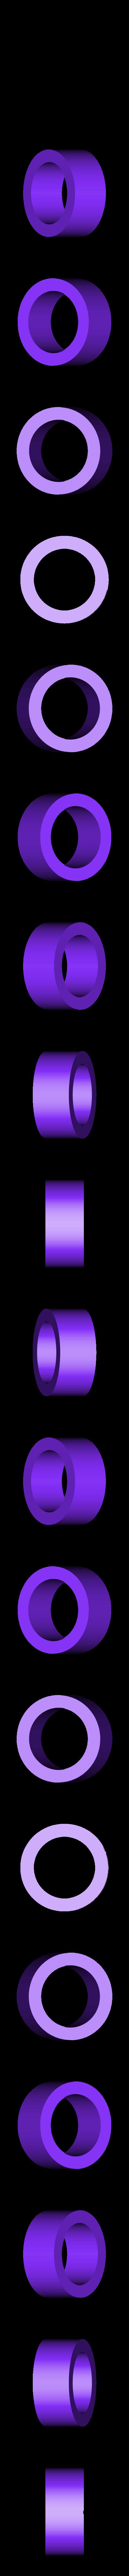 Table-SAW - sleeve-1.STL Download free STL file Table SAW • 3D print object, perinski